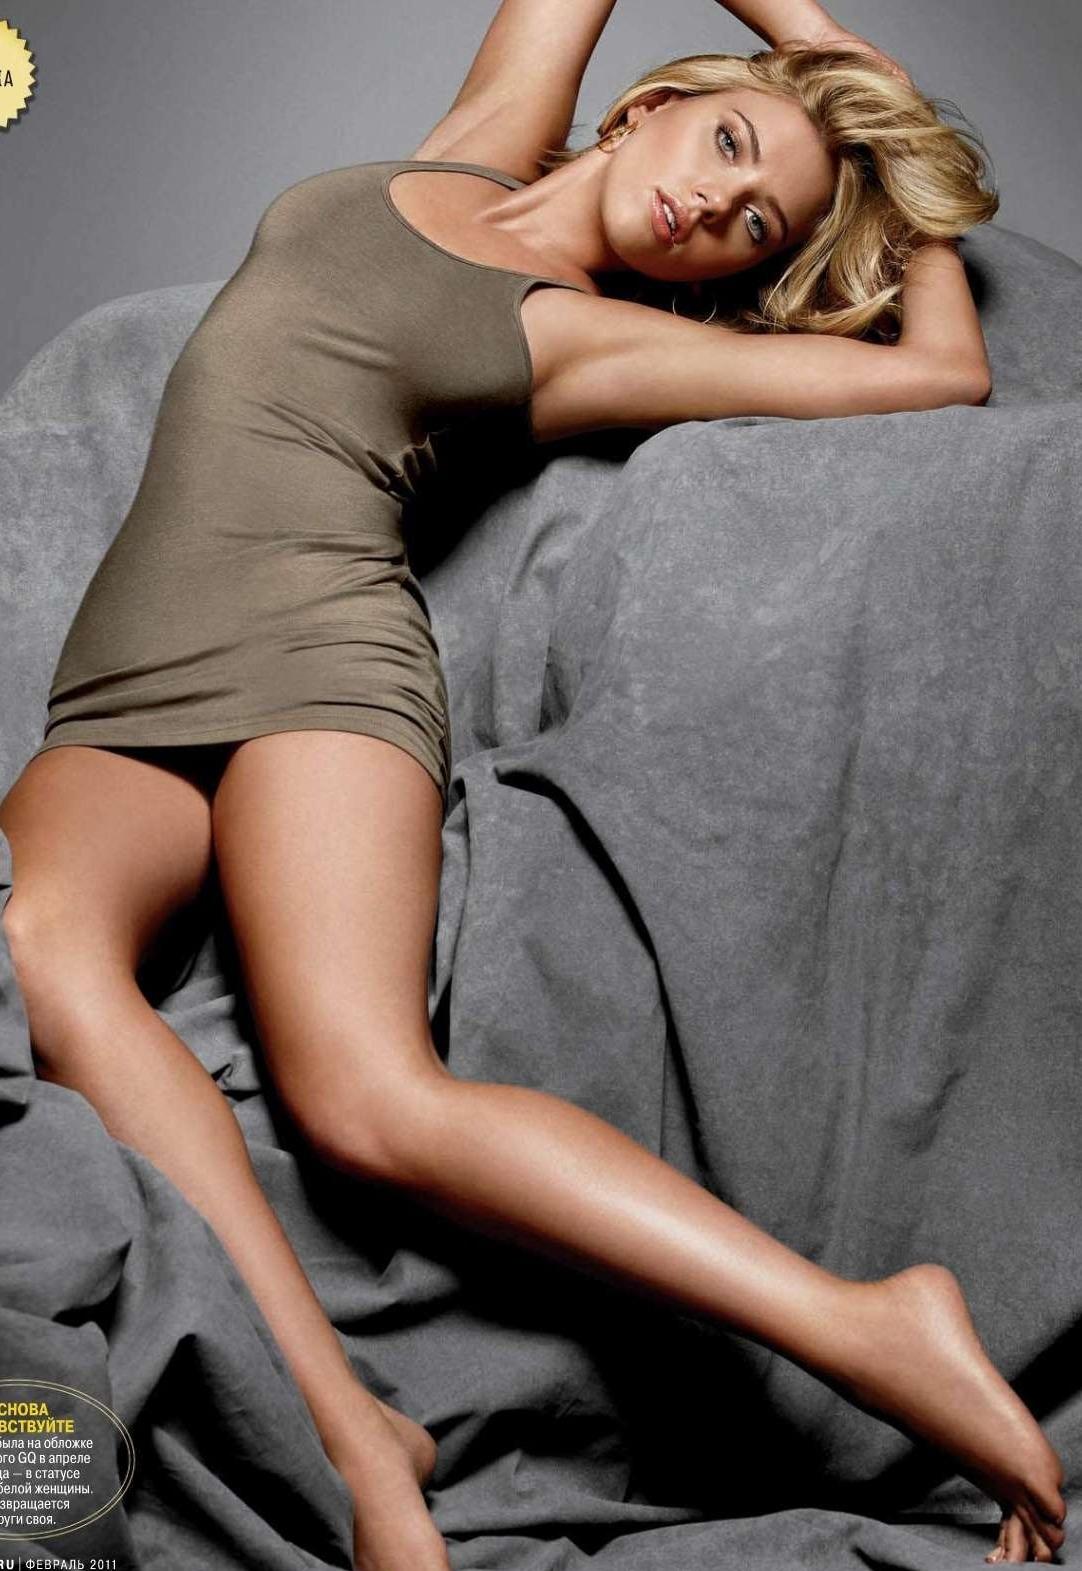 http://2.bp.blogspot.com/_aOVUVB-gmBA/TTkug4c0cYI/AAAAAAABCMI/wWSGL2u_-0M/s1600/Scarlett_Johansson_Hot_02.jpg